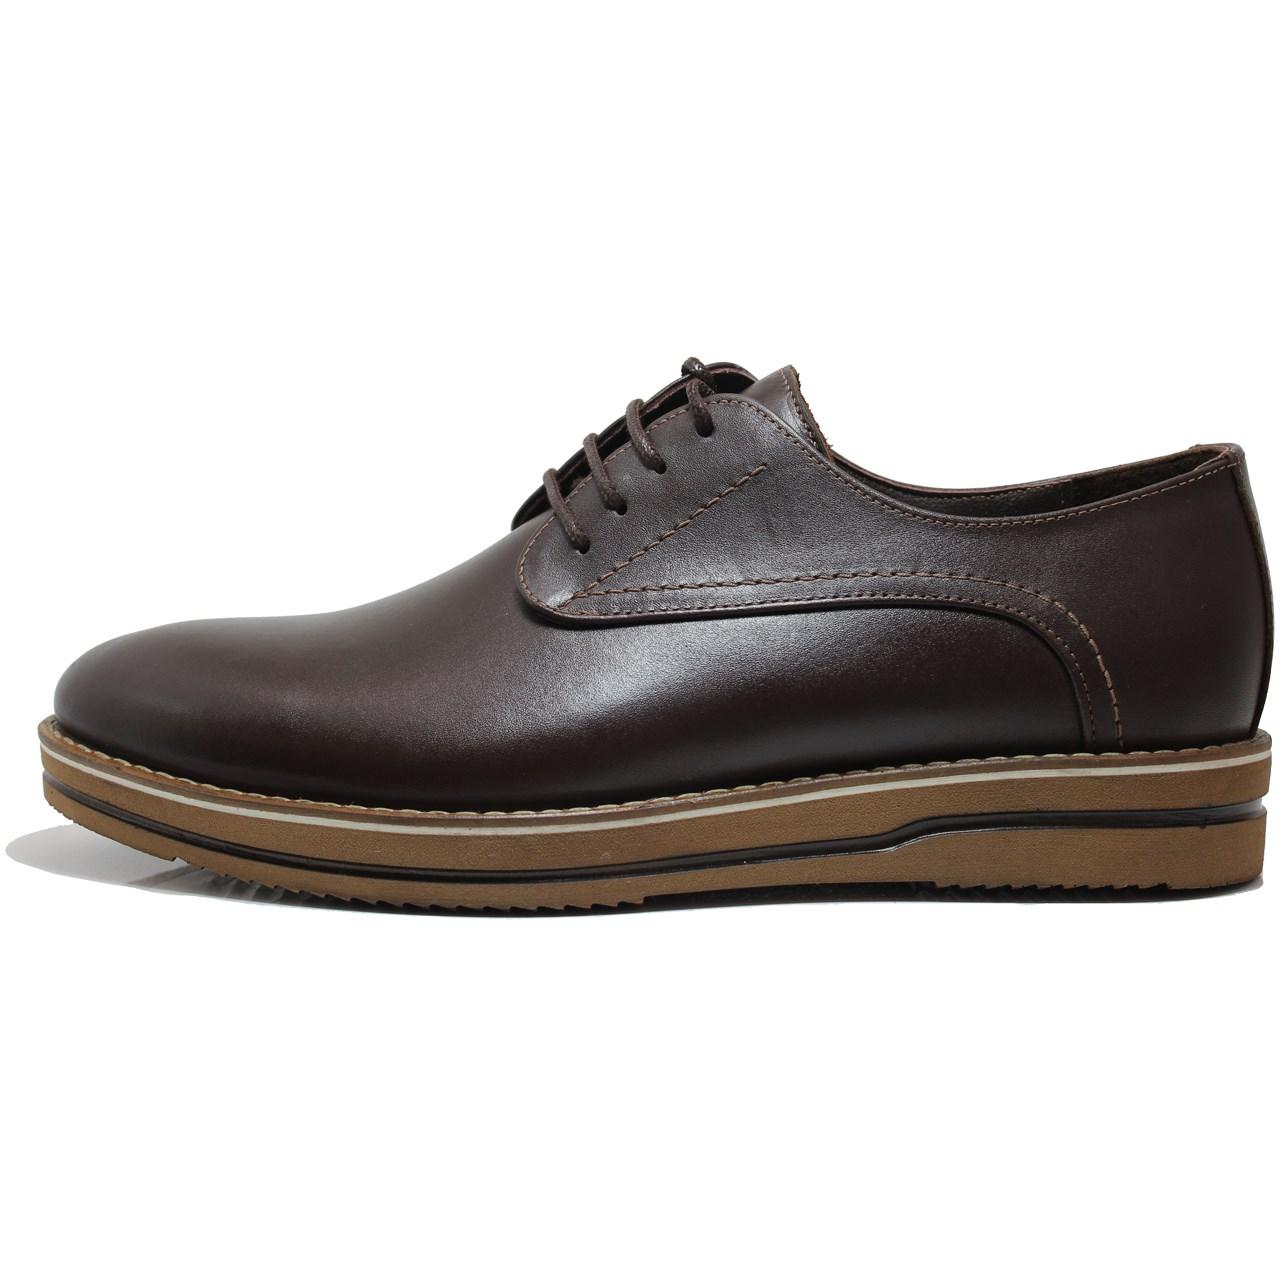 کفش مردانه چرم طبیعی  ژست مدل 1102